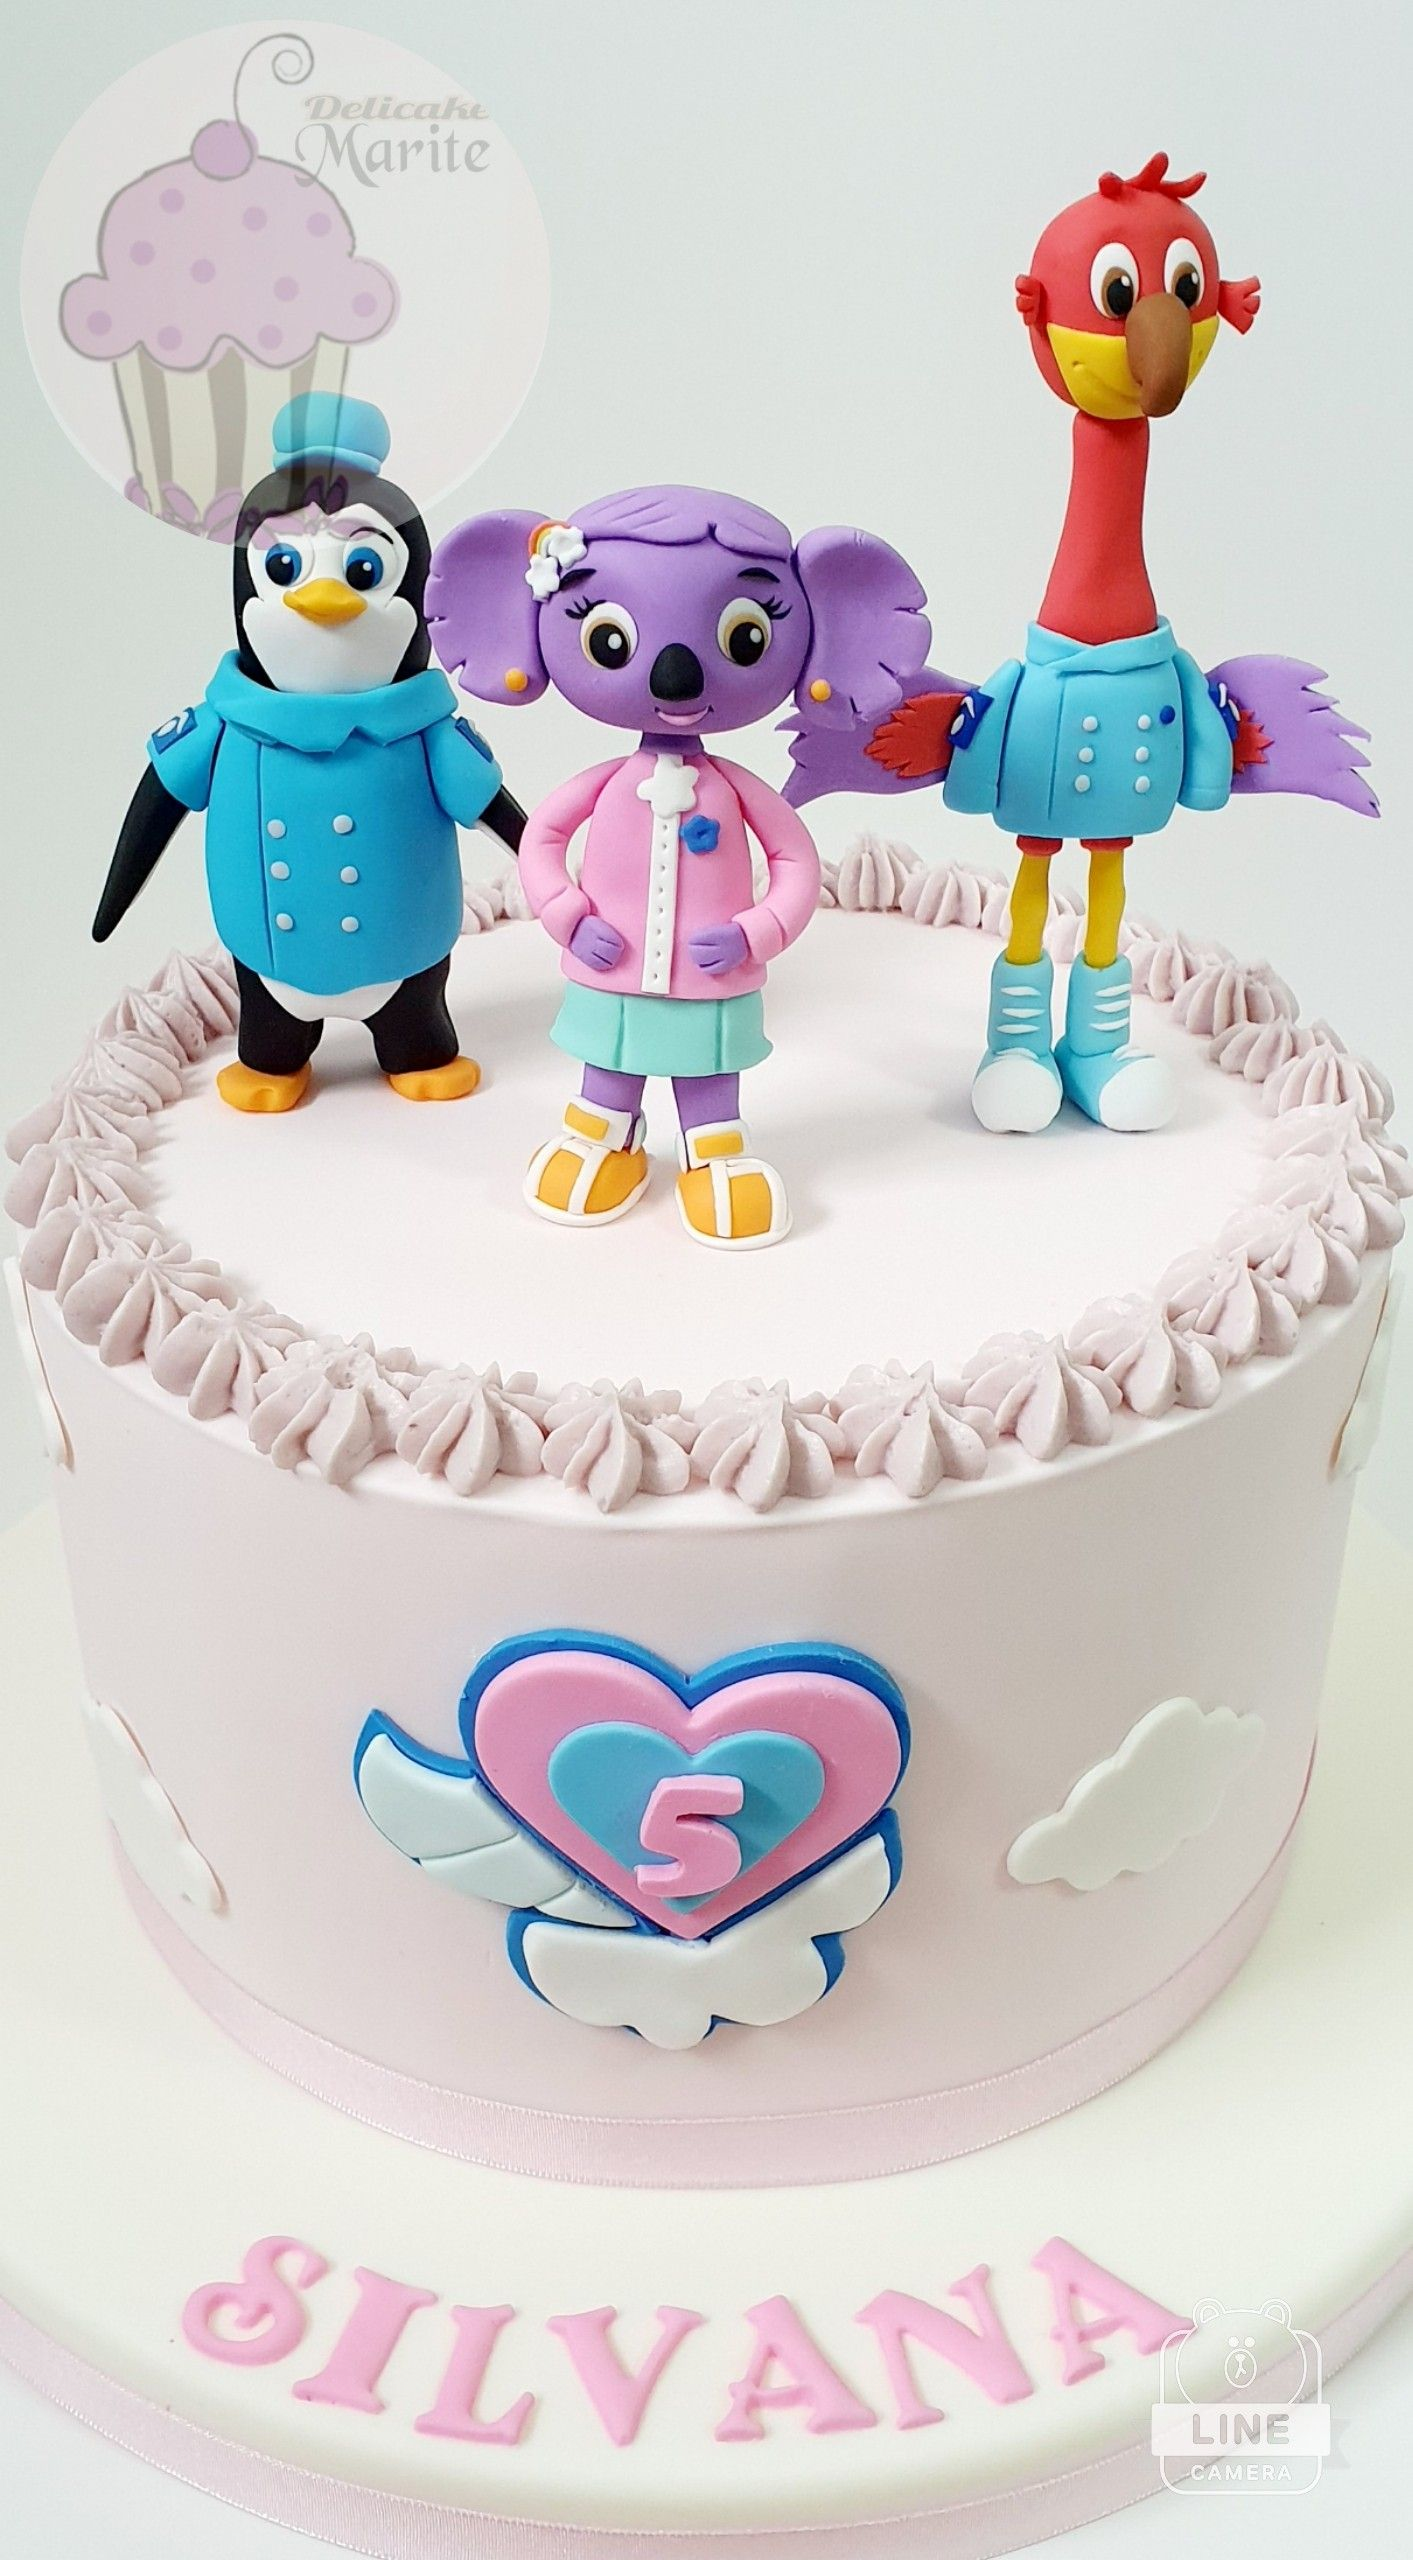 Kids Gift First Birthday Outfit Girls Birthday Outfit Mia Tots Birthday Outfit Mia the cat Birthday Outfit Cat Birthday Outfit